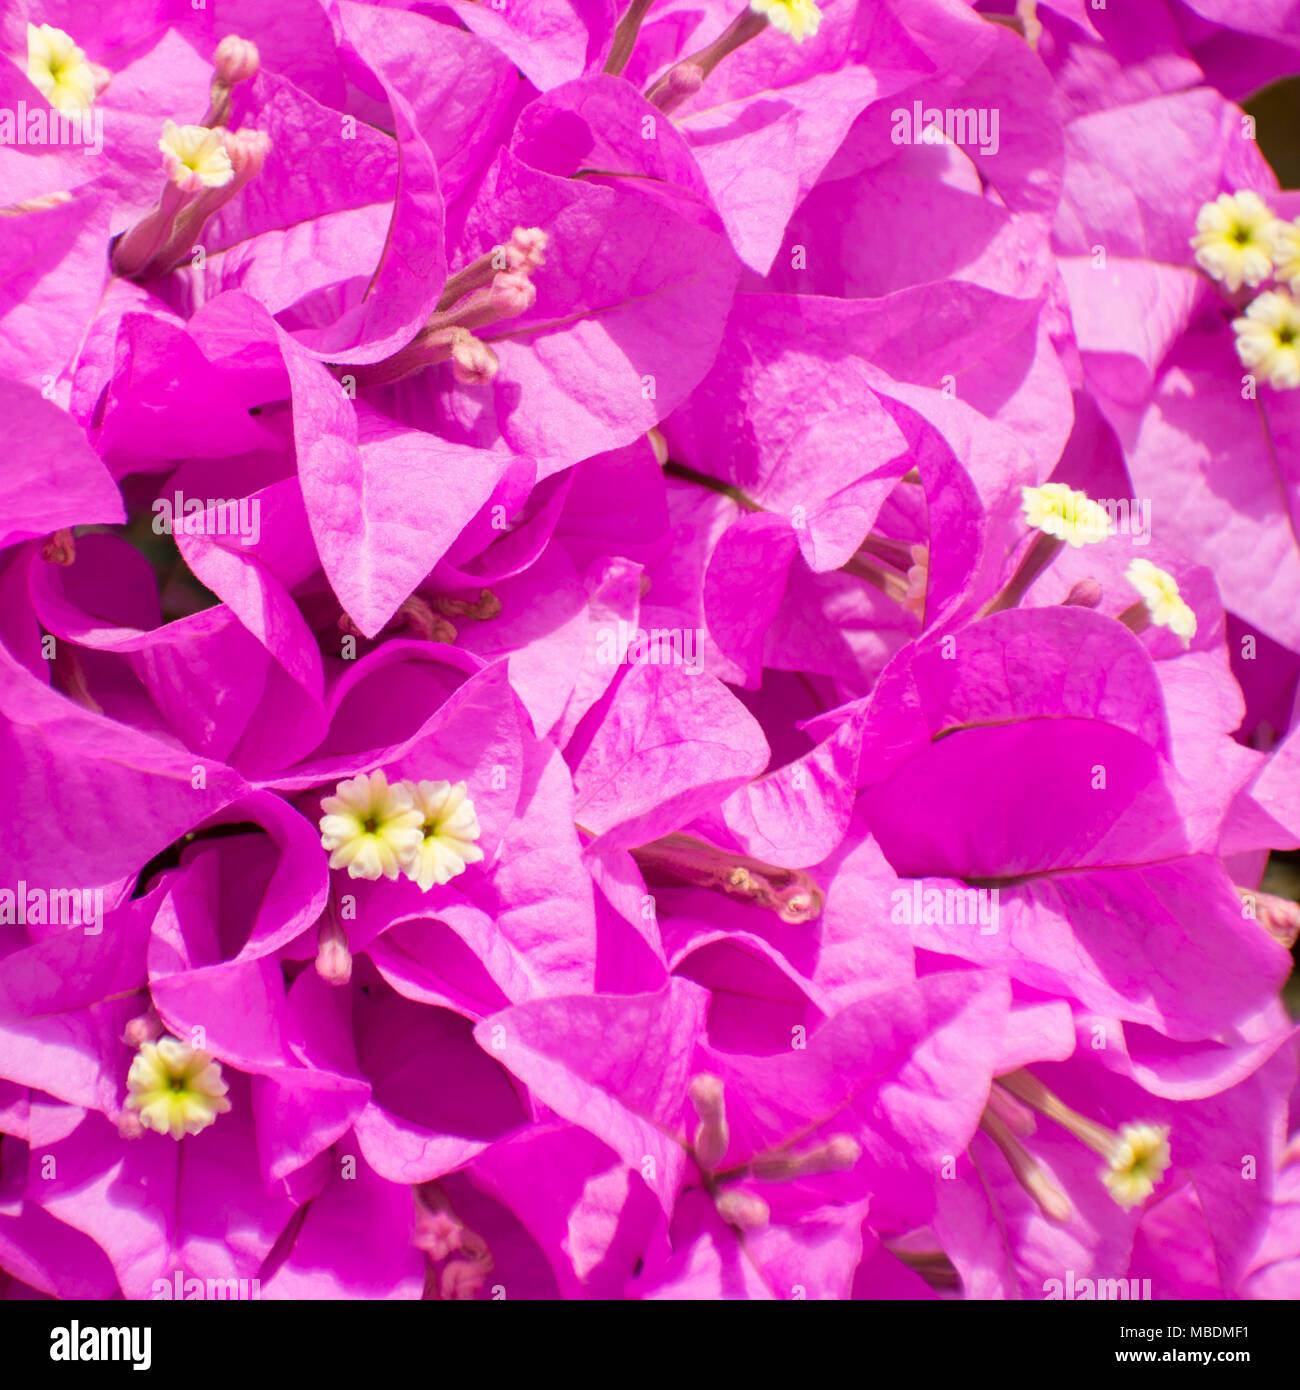 Purple paper flower bush stock photos purple paper flower bush purple bougainvillea or paper flower select focus background stock image mightylinksfo